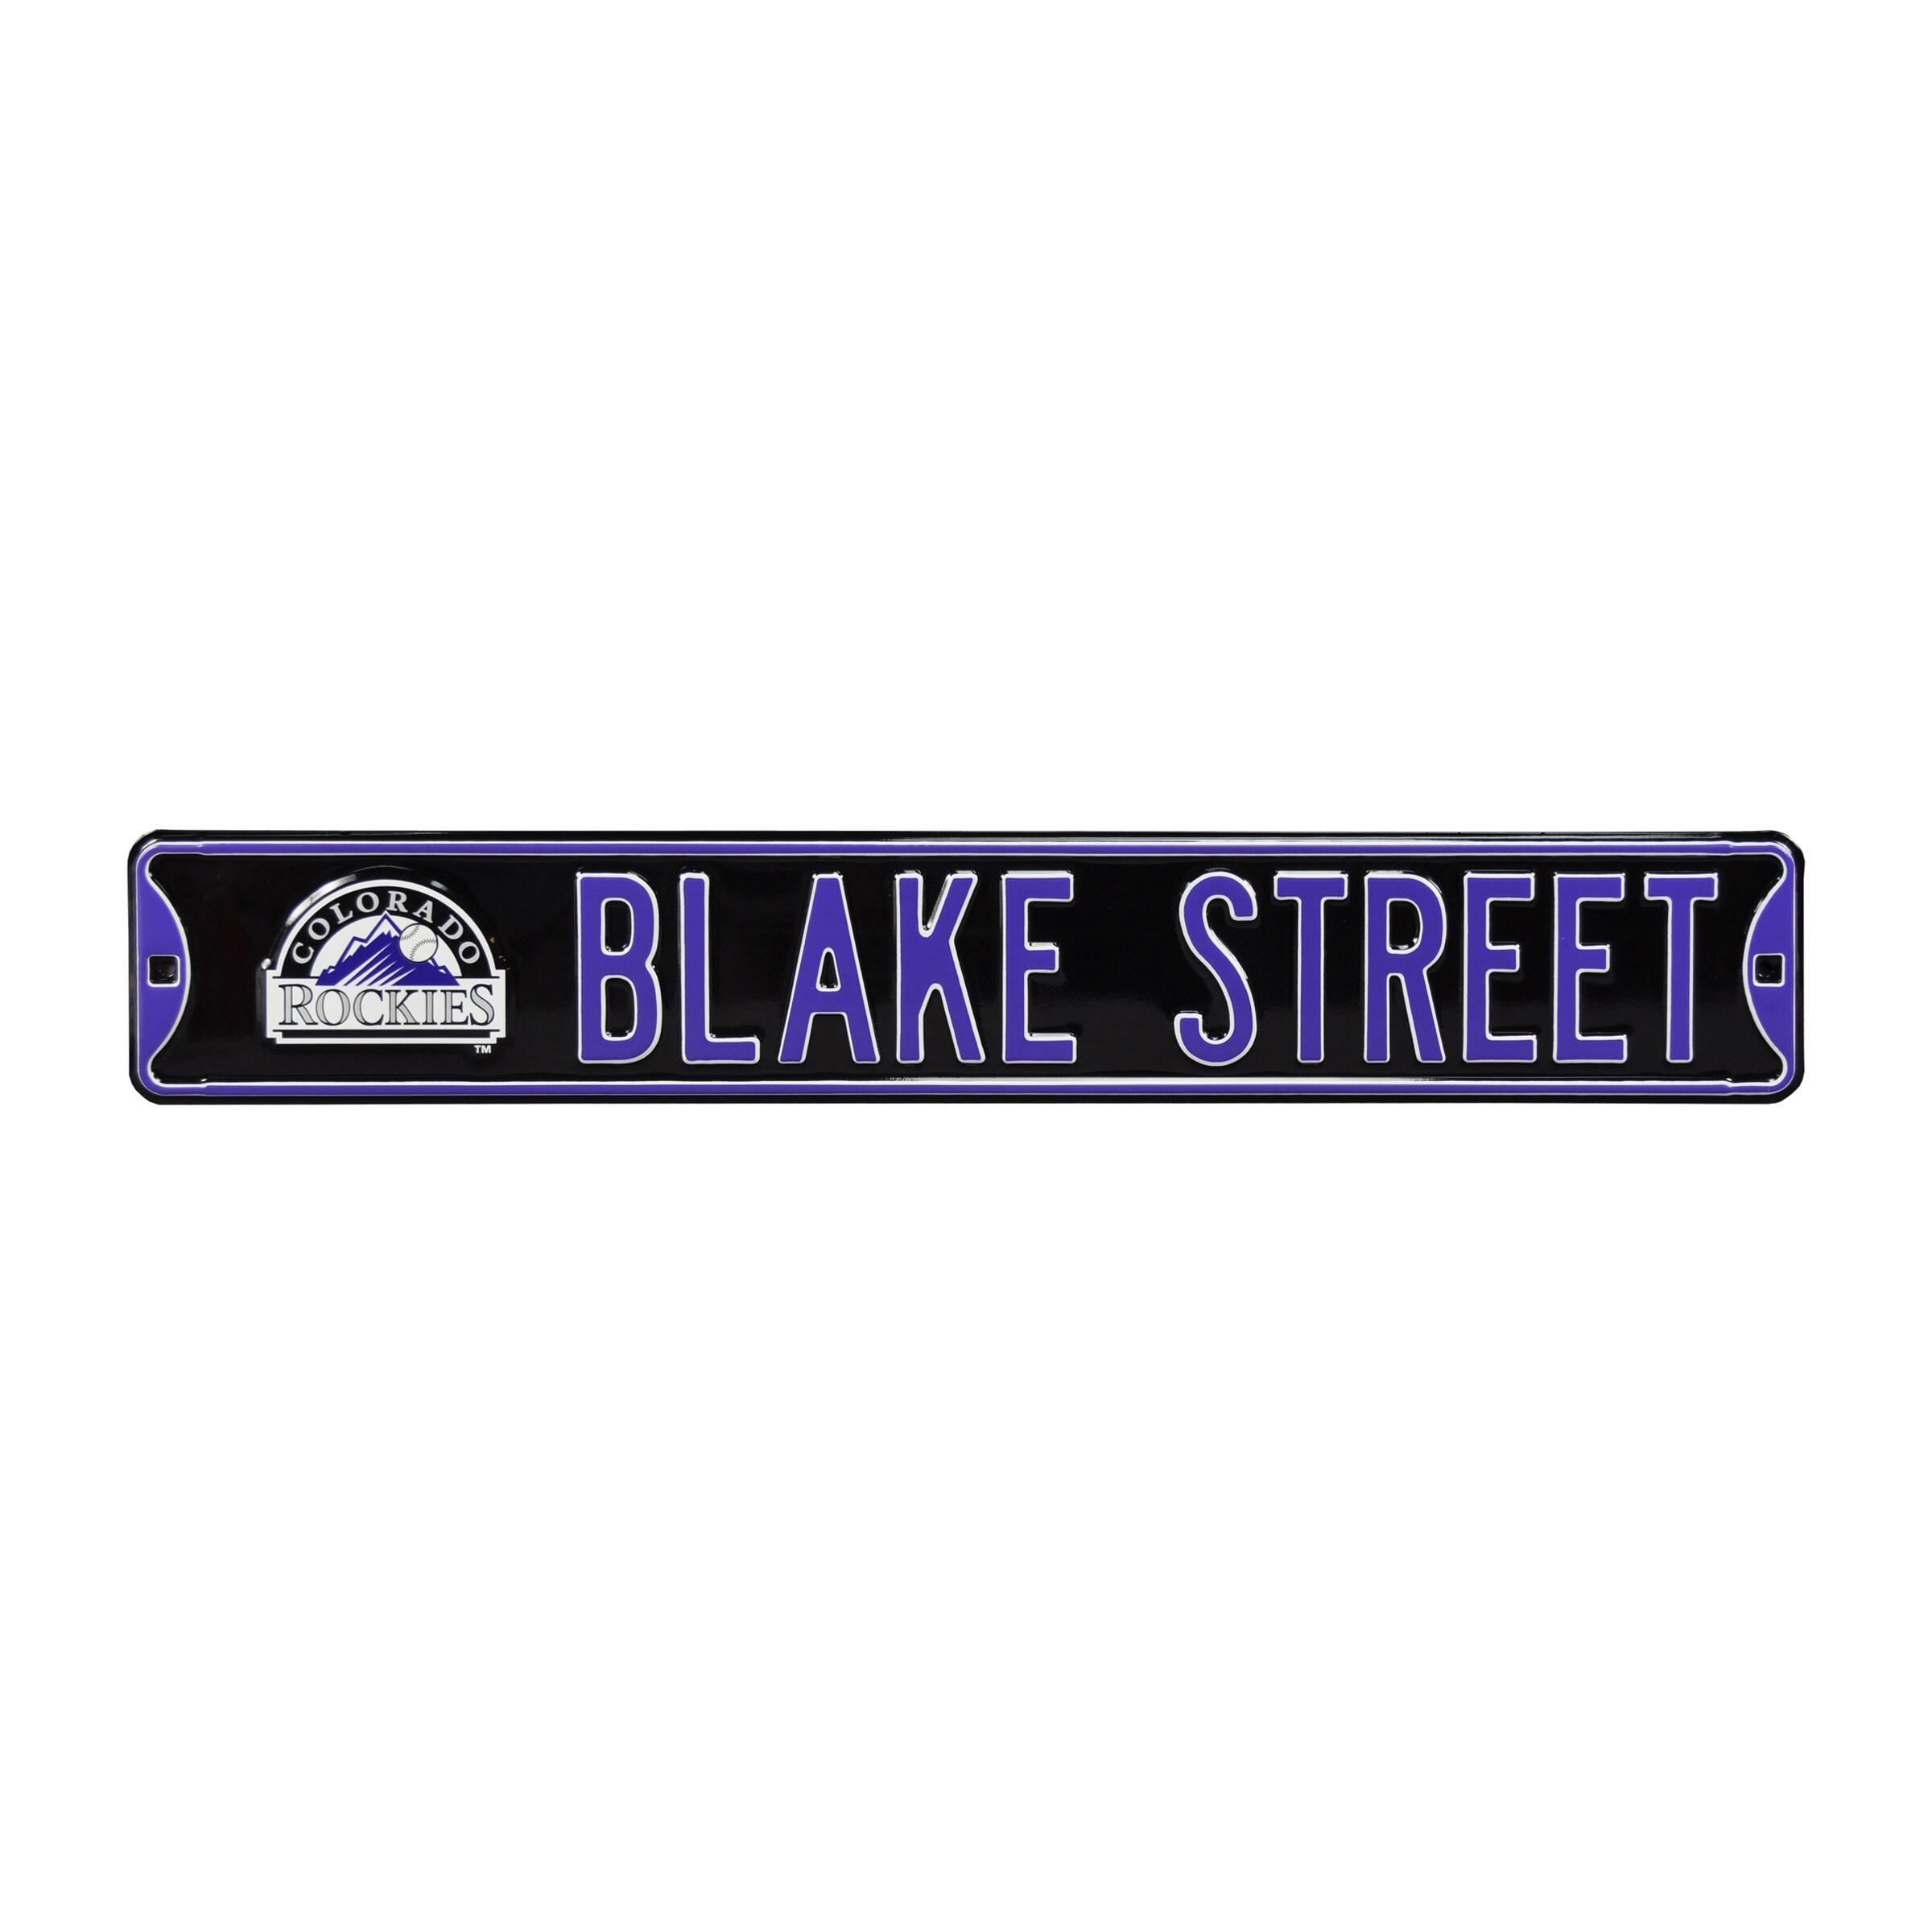 "Colorado Rockies 6"" x 36"" Blake Street Steel Ave Sign Wall Art - Black"